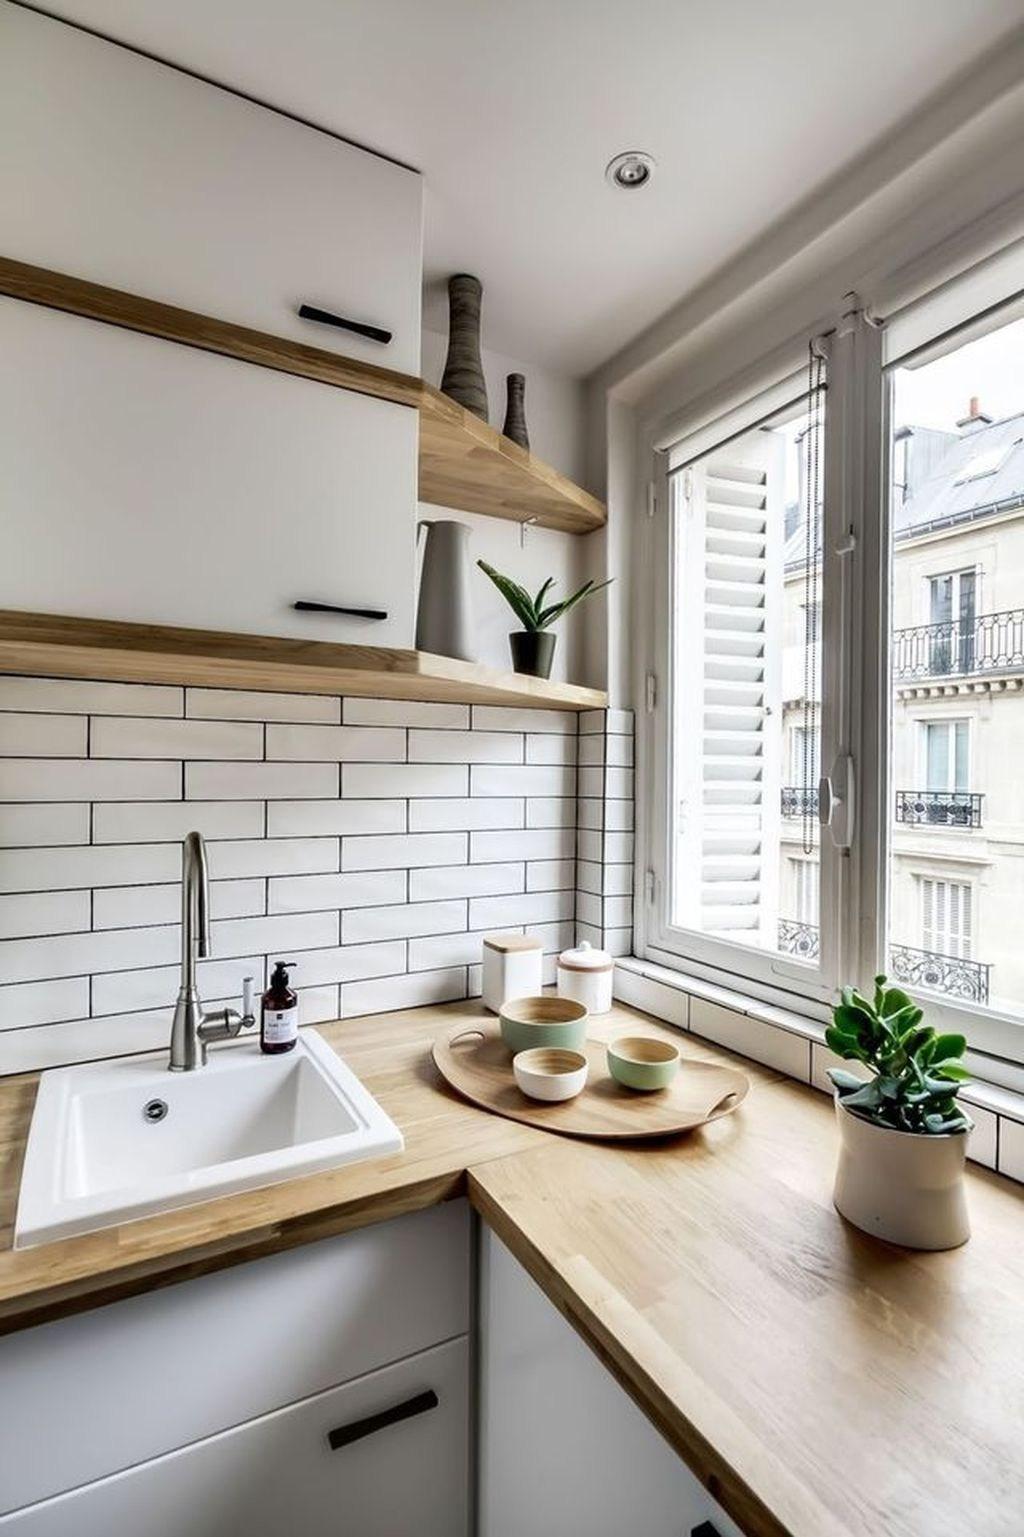 scandinavian kitchen furniture design ideas (11)